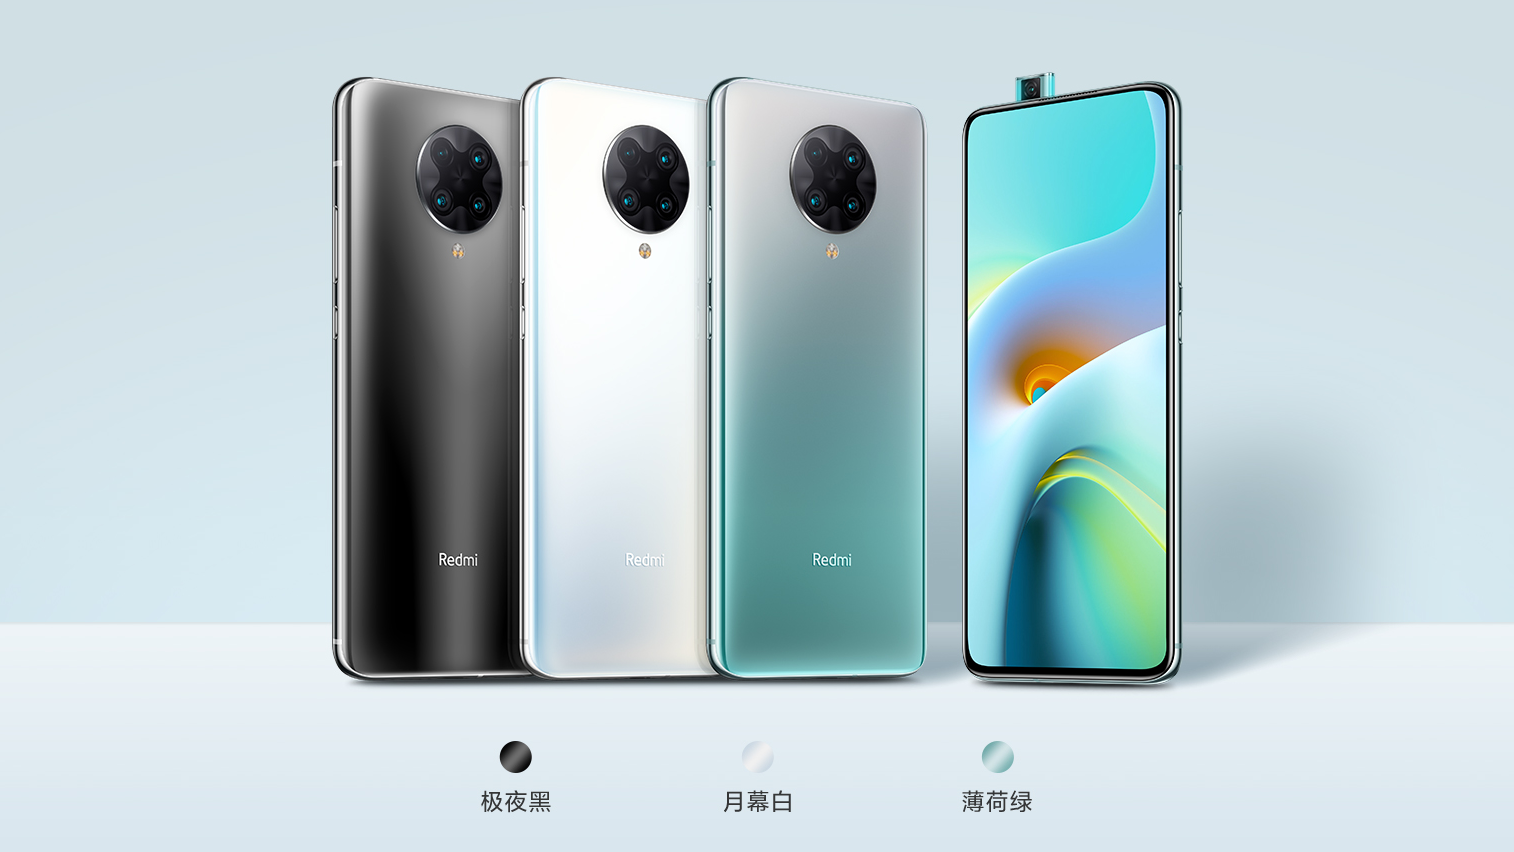 Xiaomi introduced the budget flagship Redmi K30 Ultra TechRechard